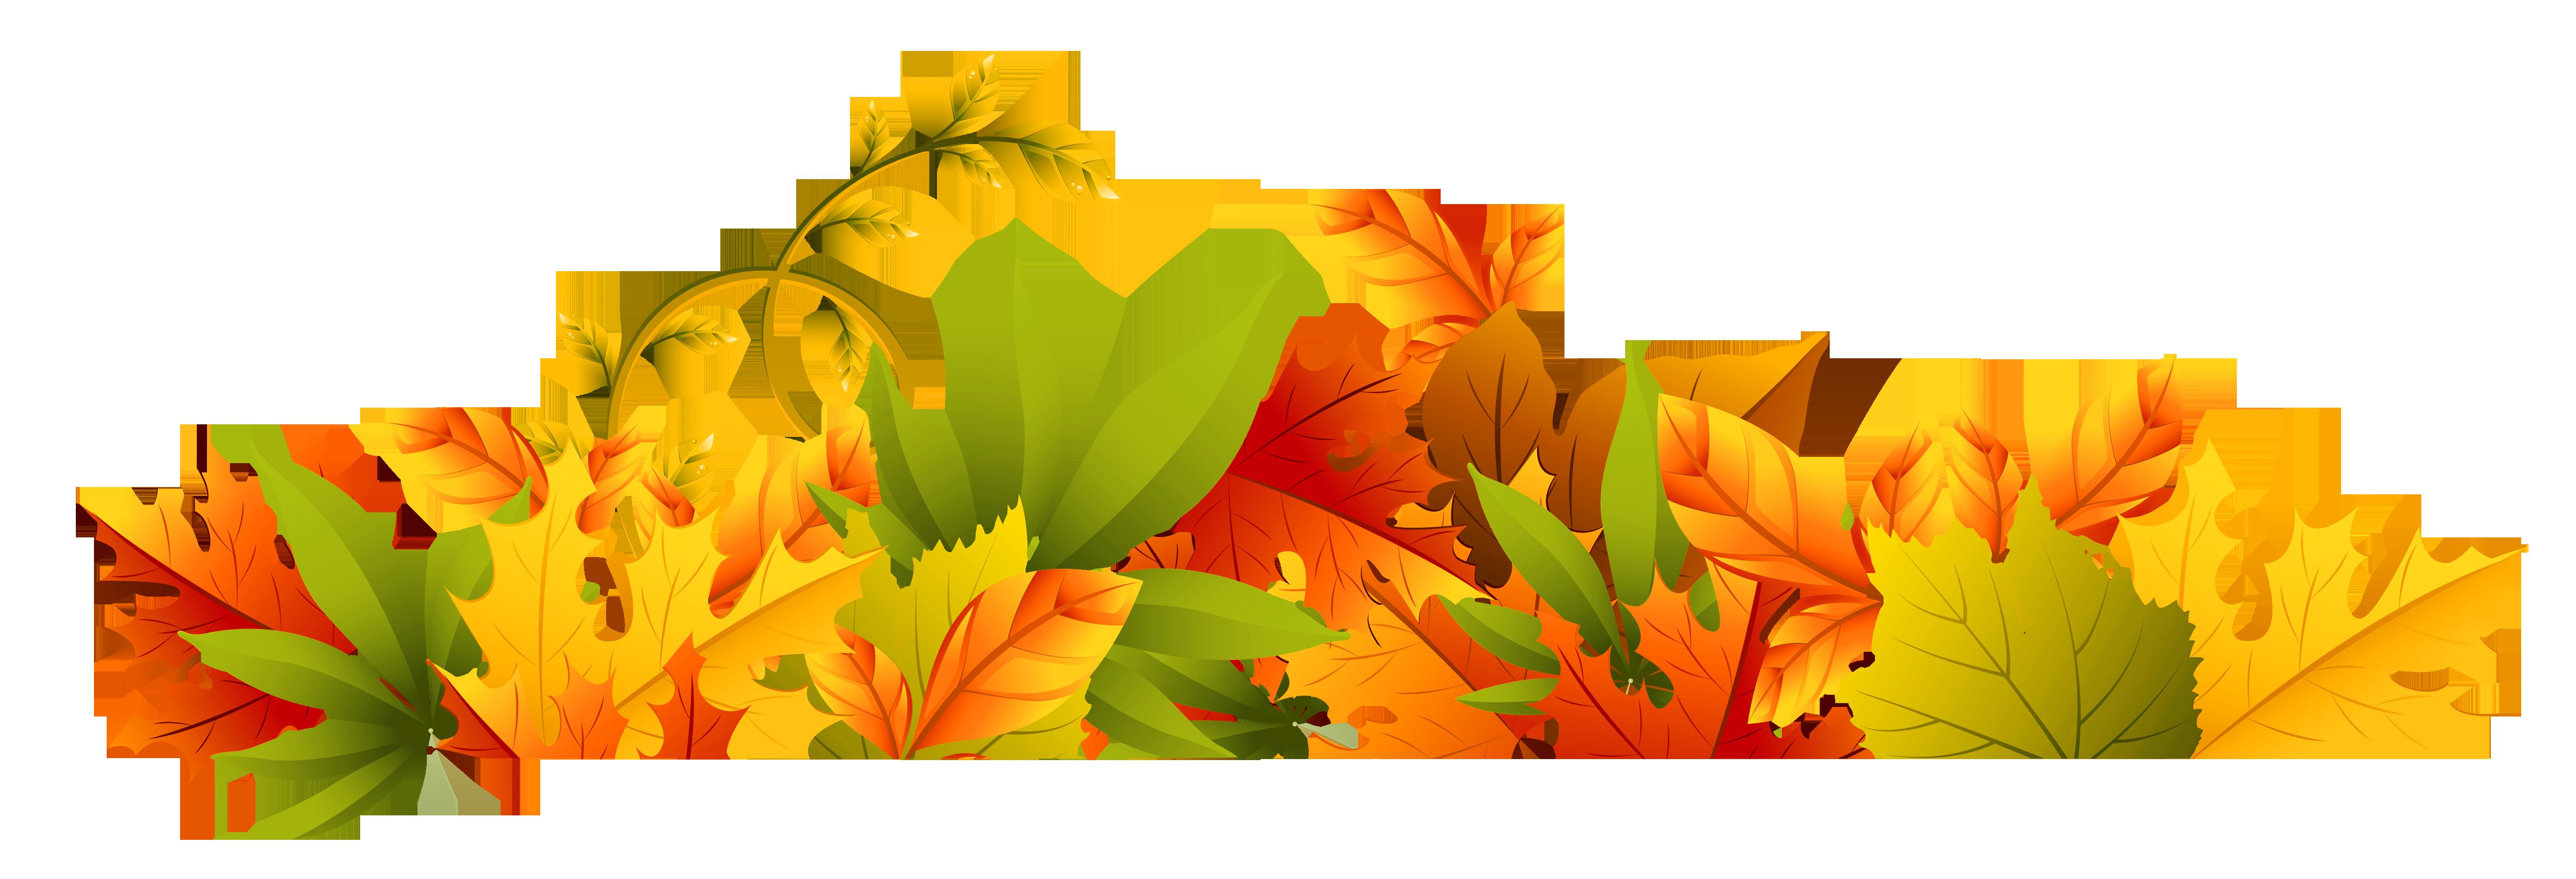 5264x1796 Fall Autumn Clip Art Free Clipart 2 Clipartcow